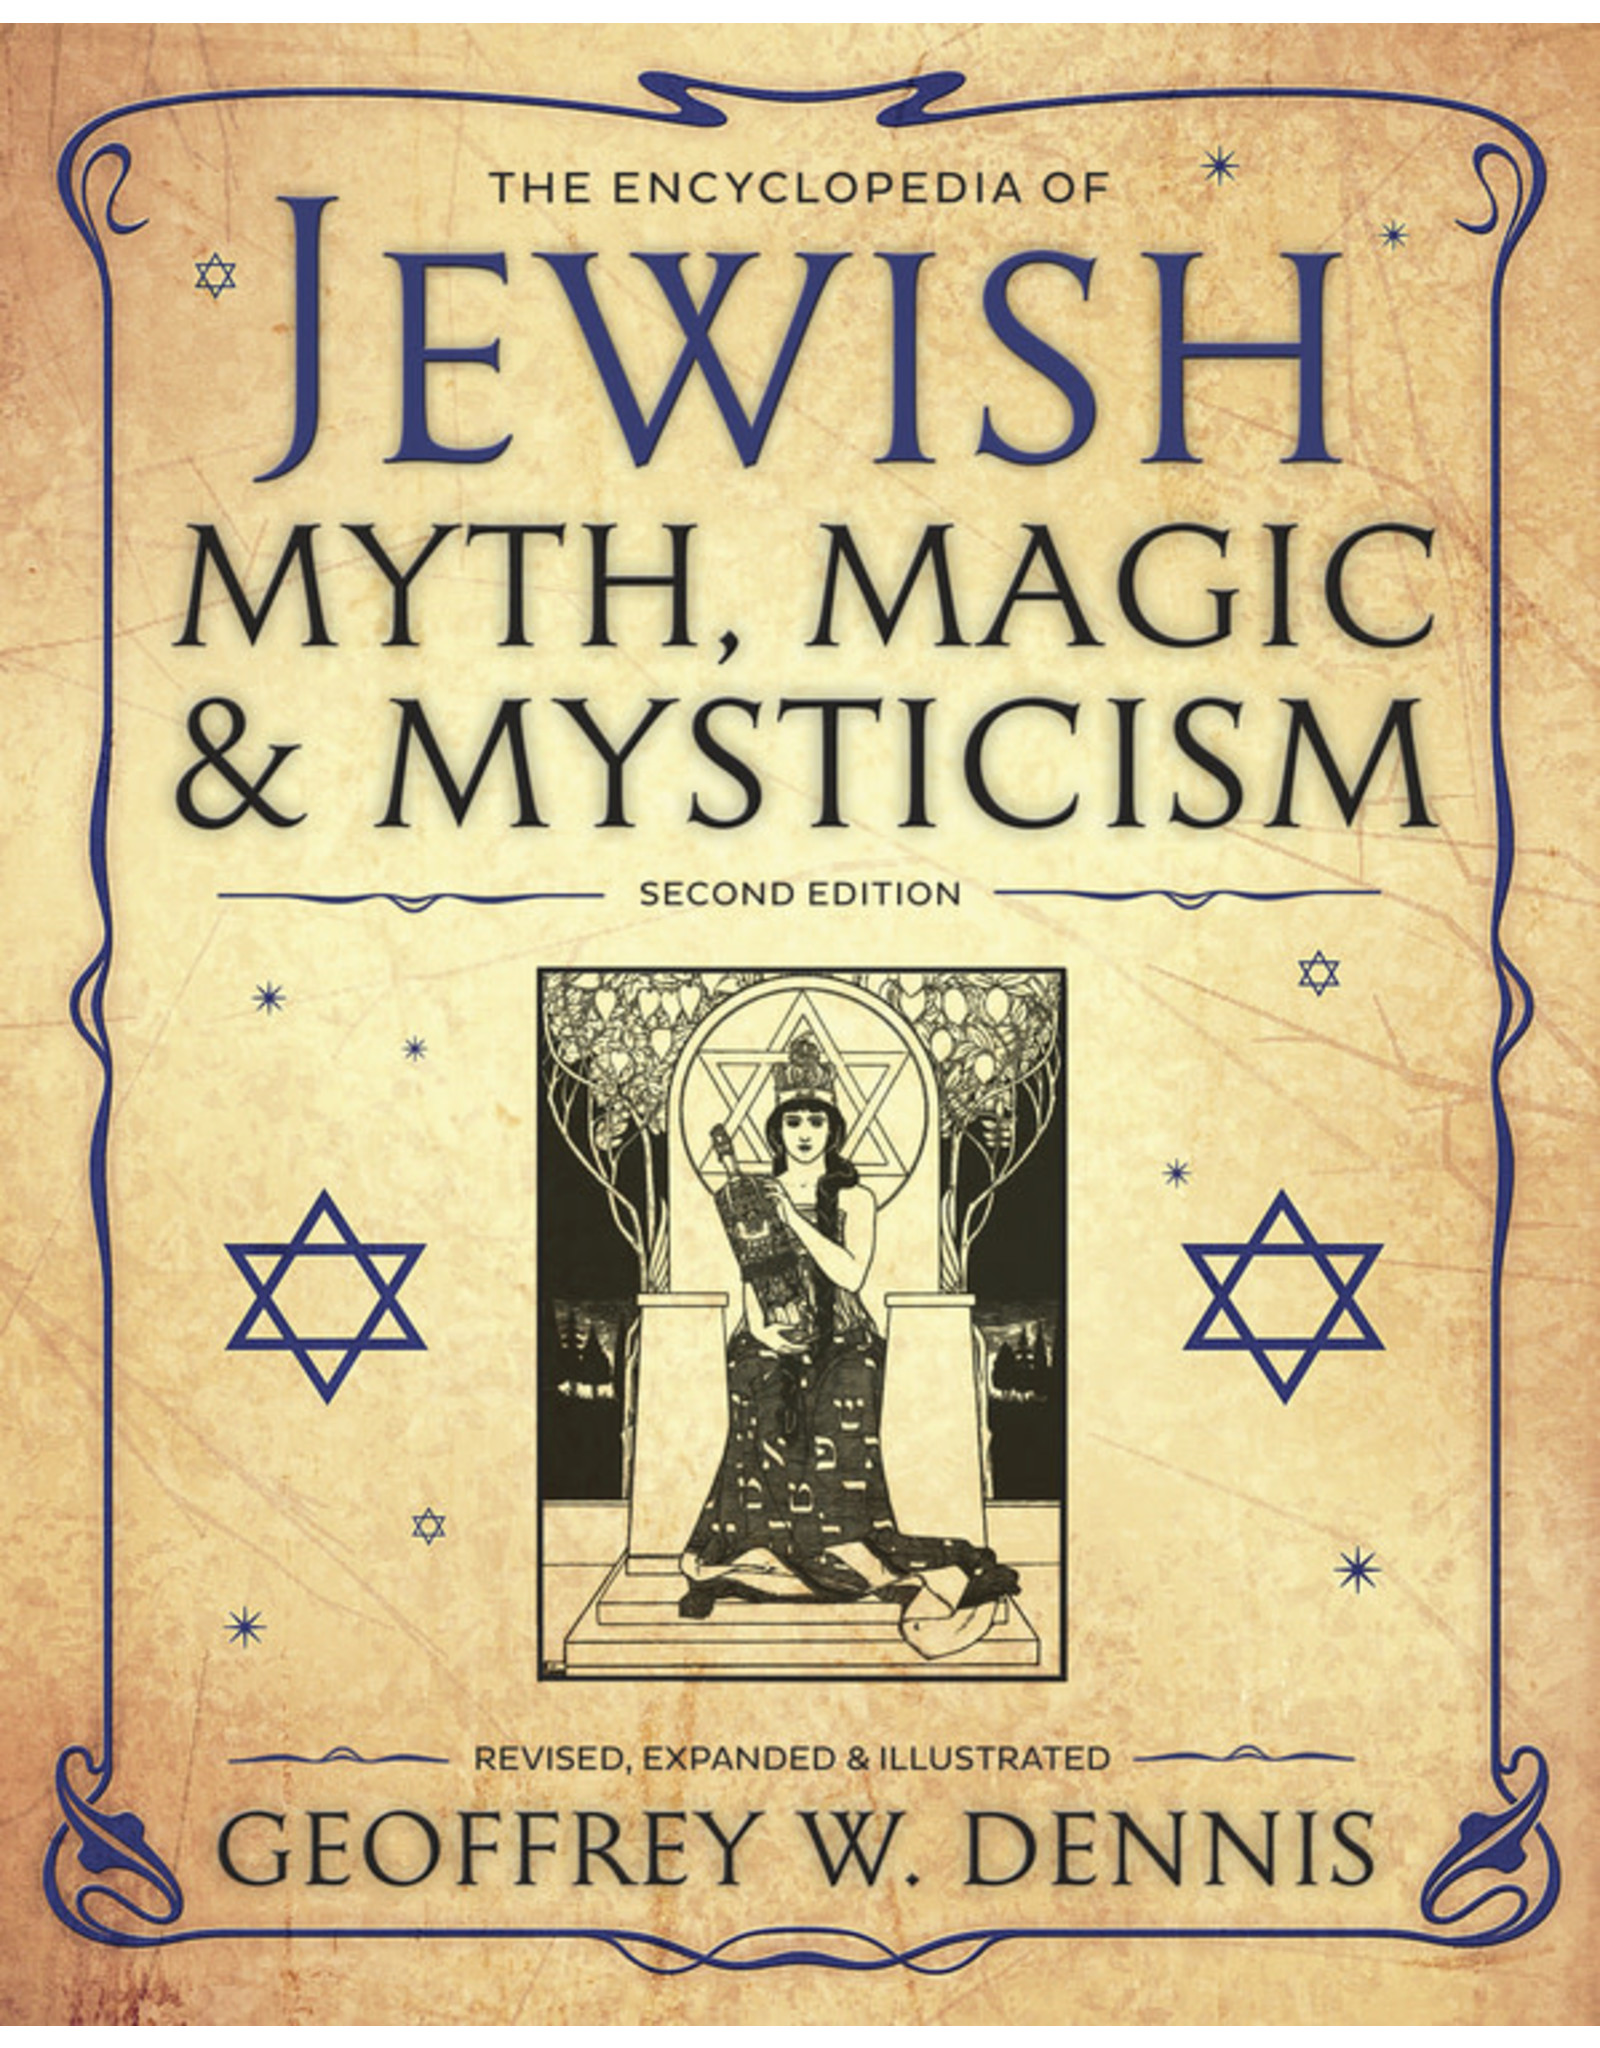 Jewish Myth, Magic & Mysticism